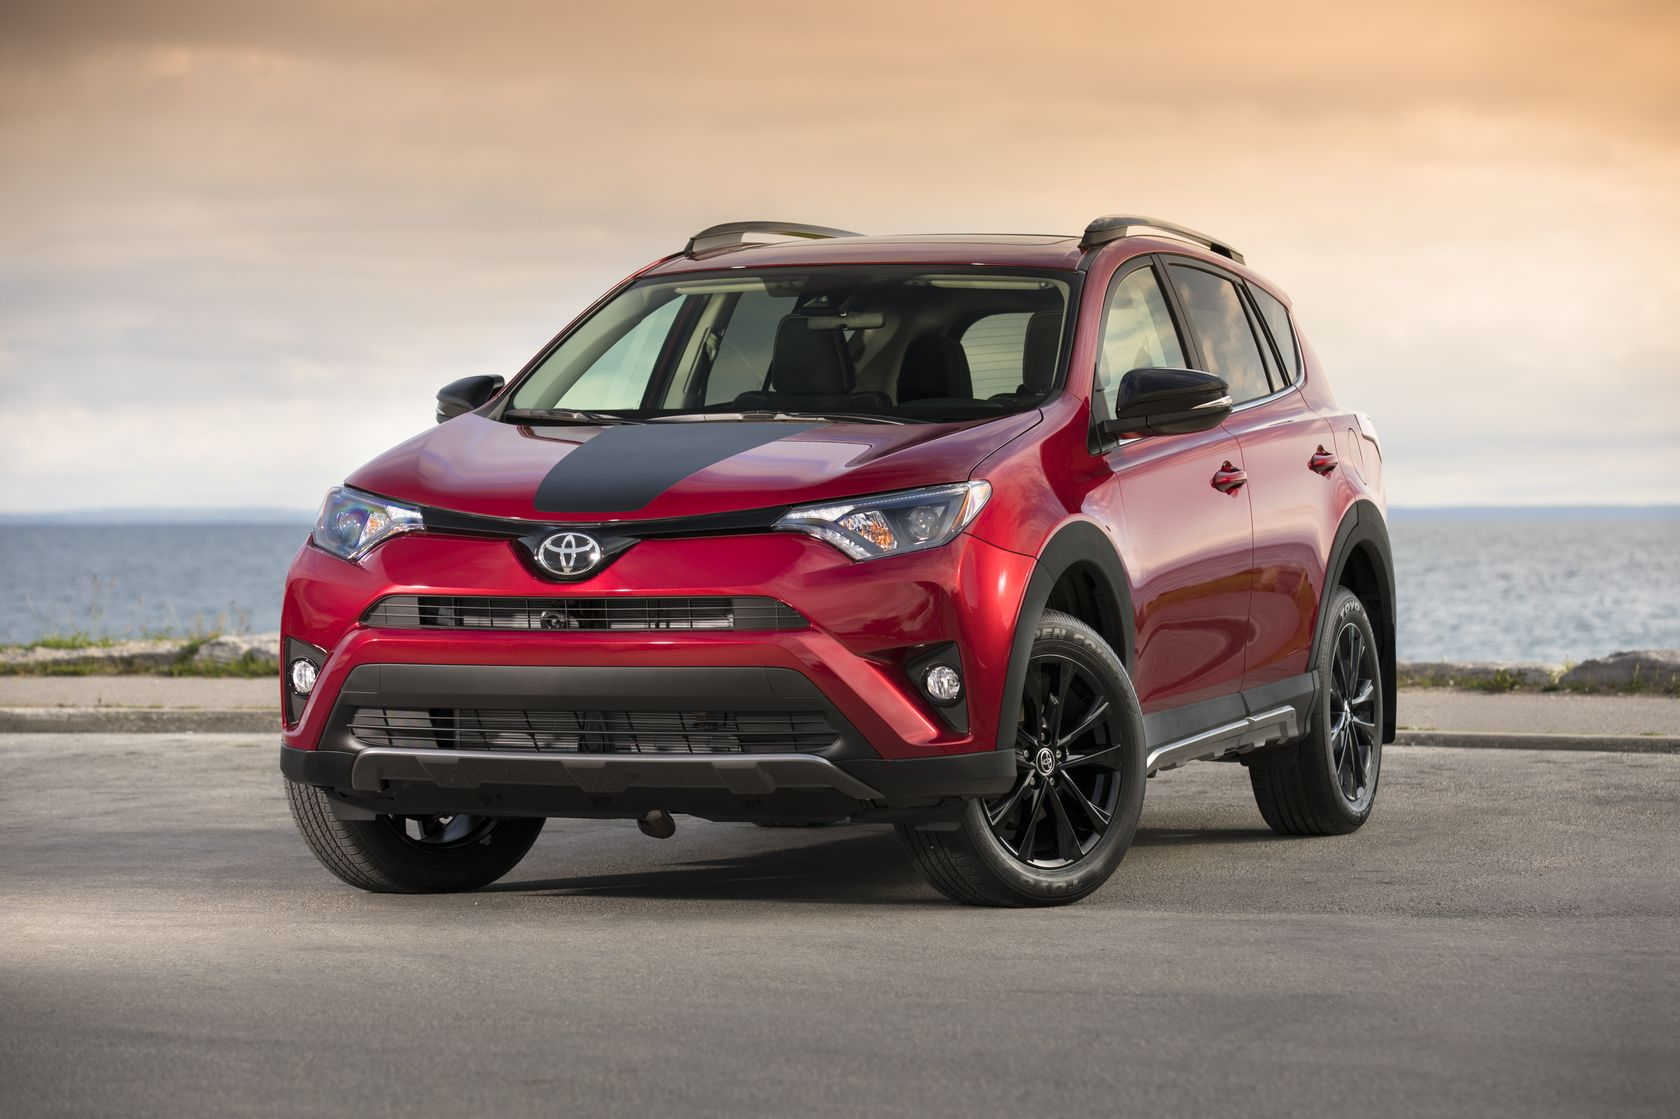 2018 Toyota Rav4 Trailer Hitch Wiring